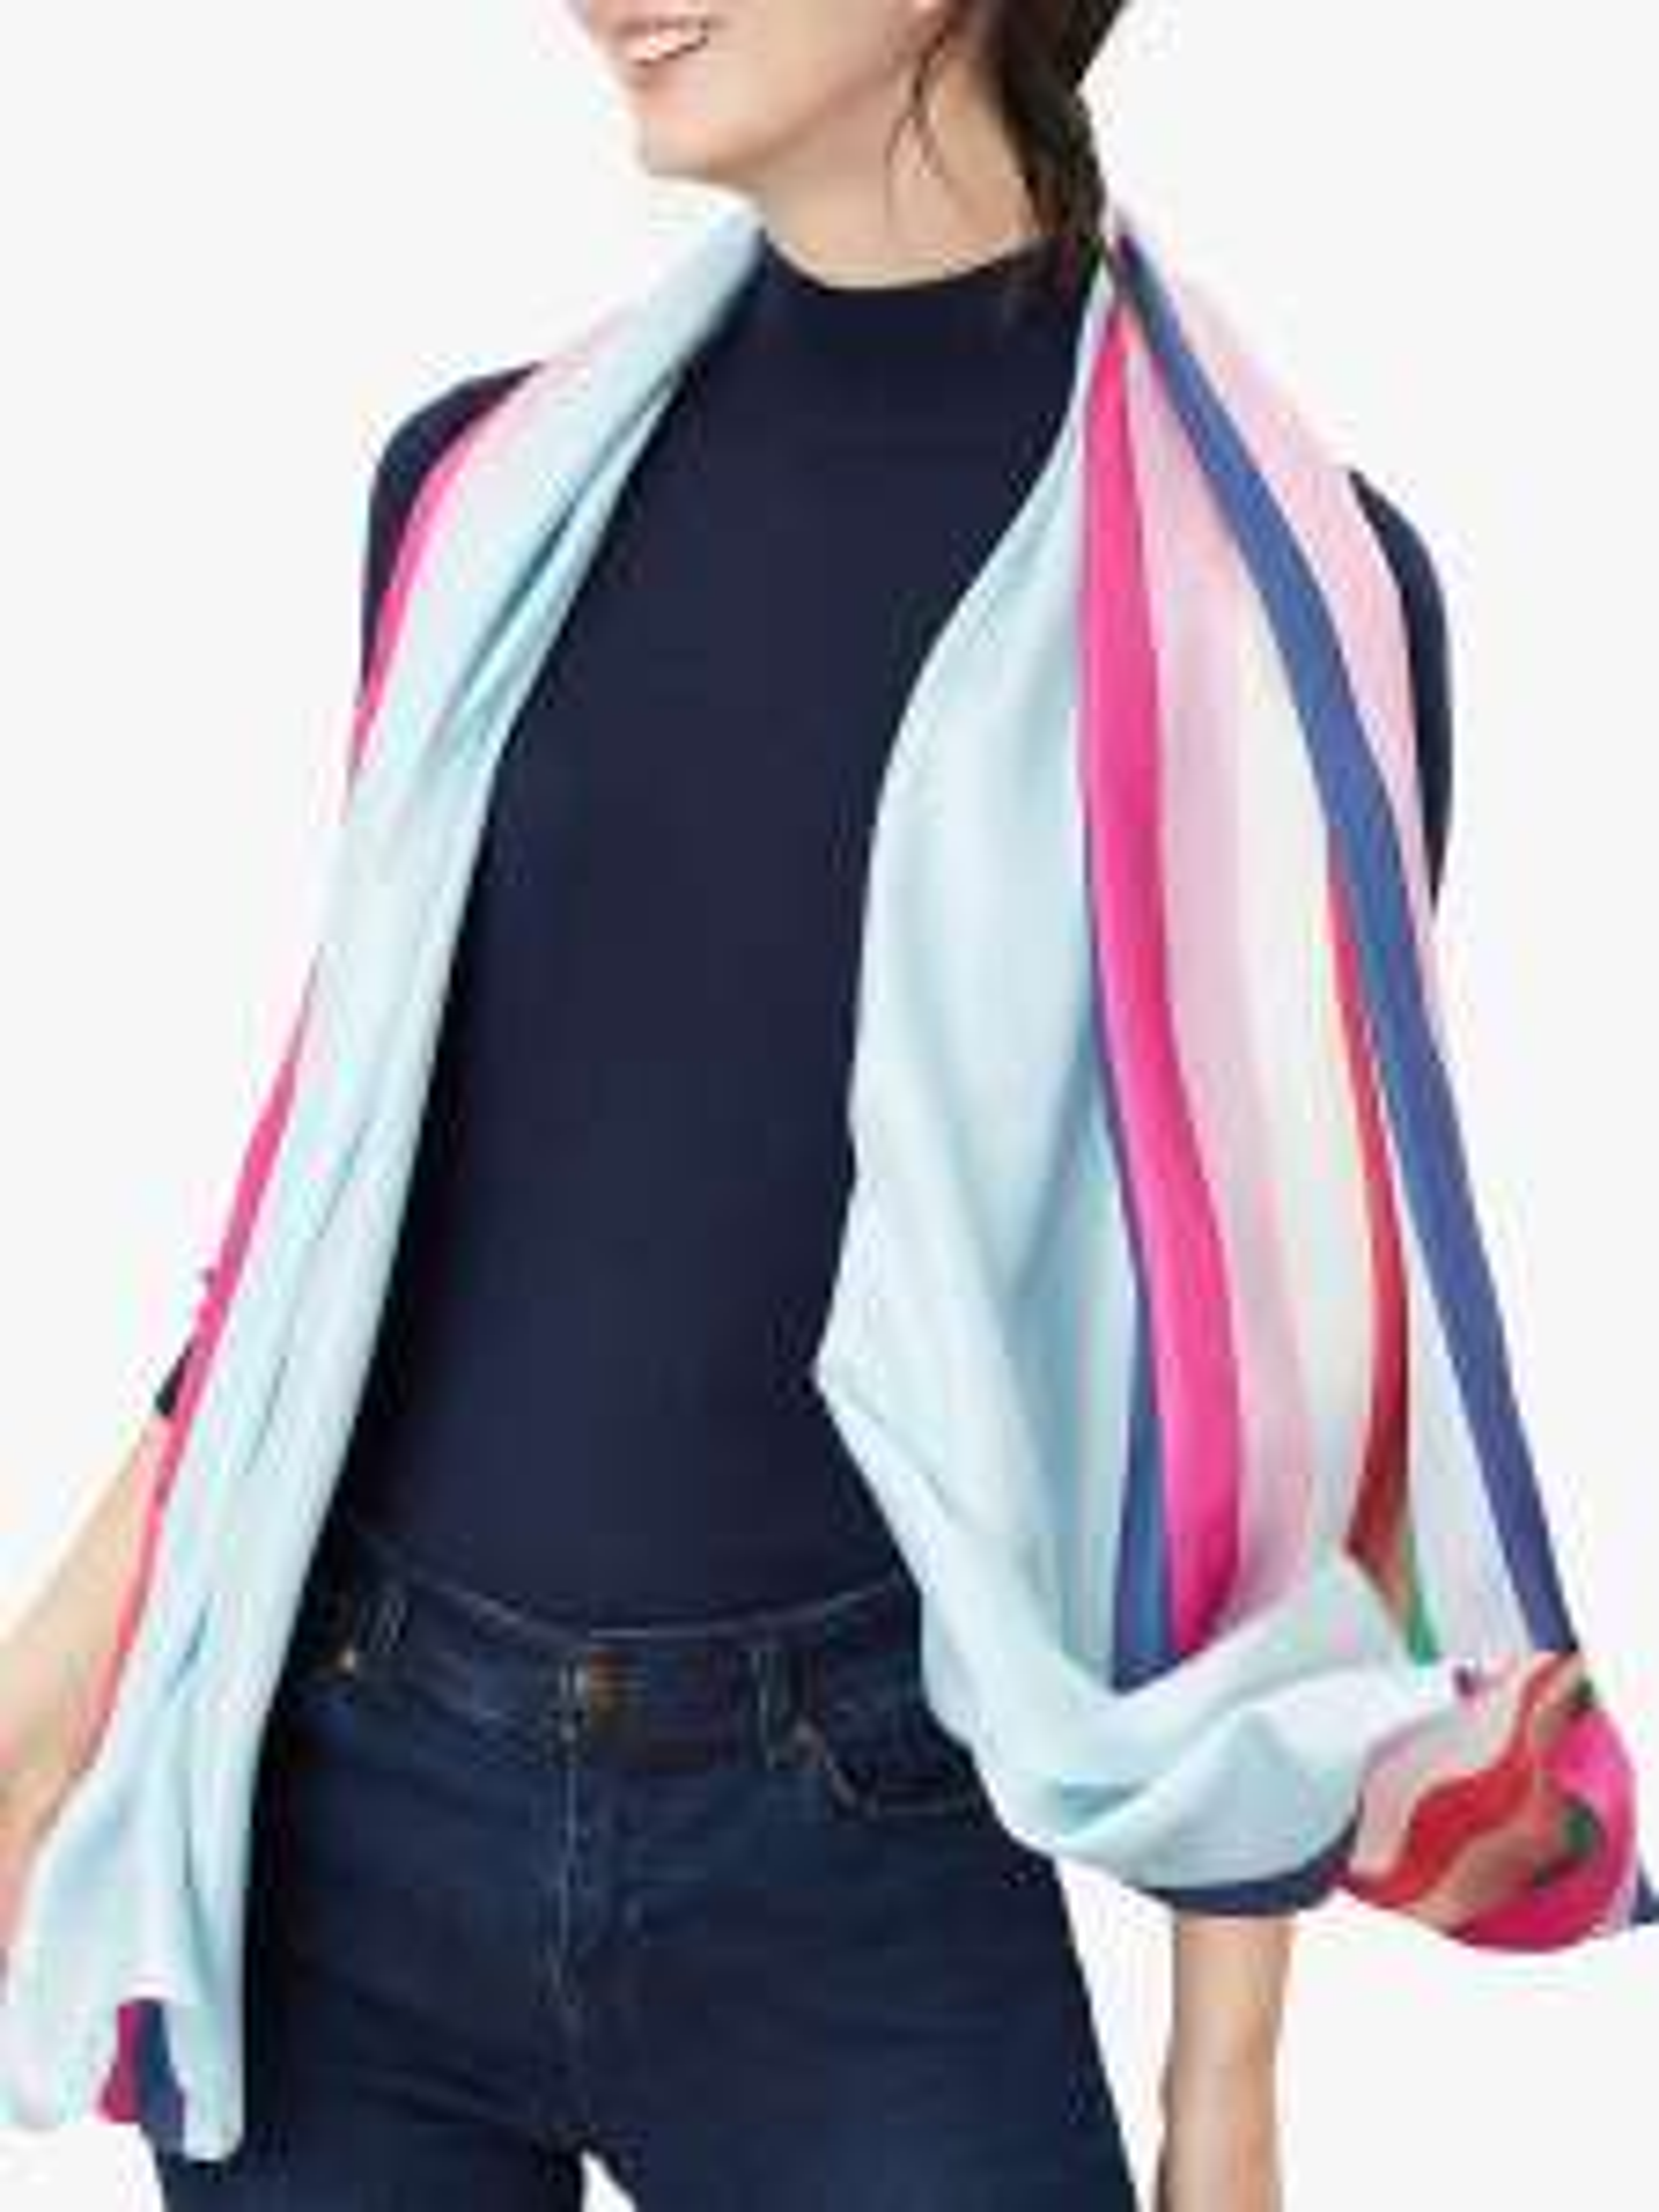 Joules Hampton Silk Stripe Scarf, Multi 100% Silk at John Lewis & Parters for £14.98 (£3 C&C)